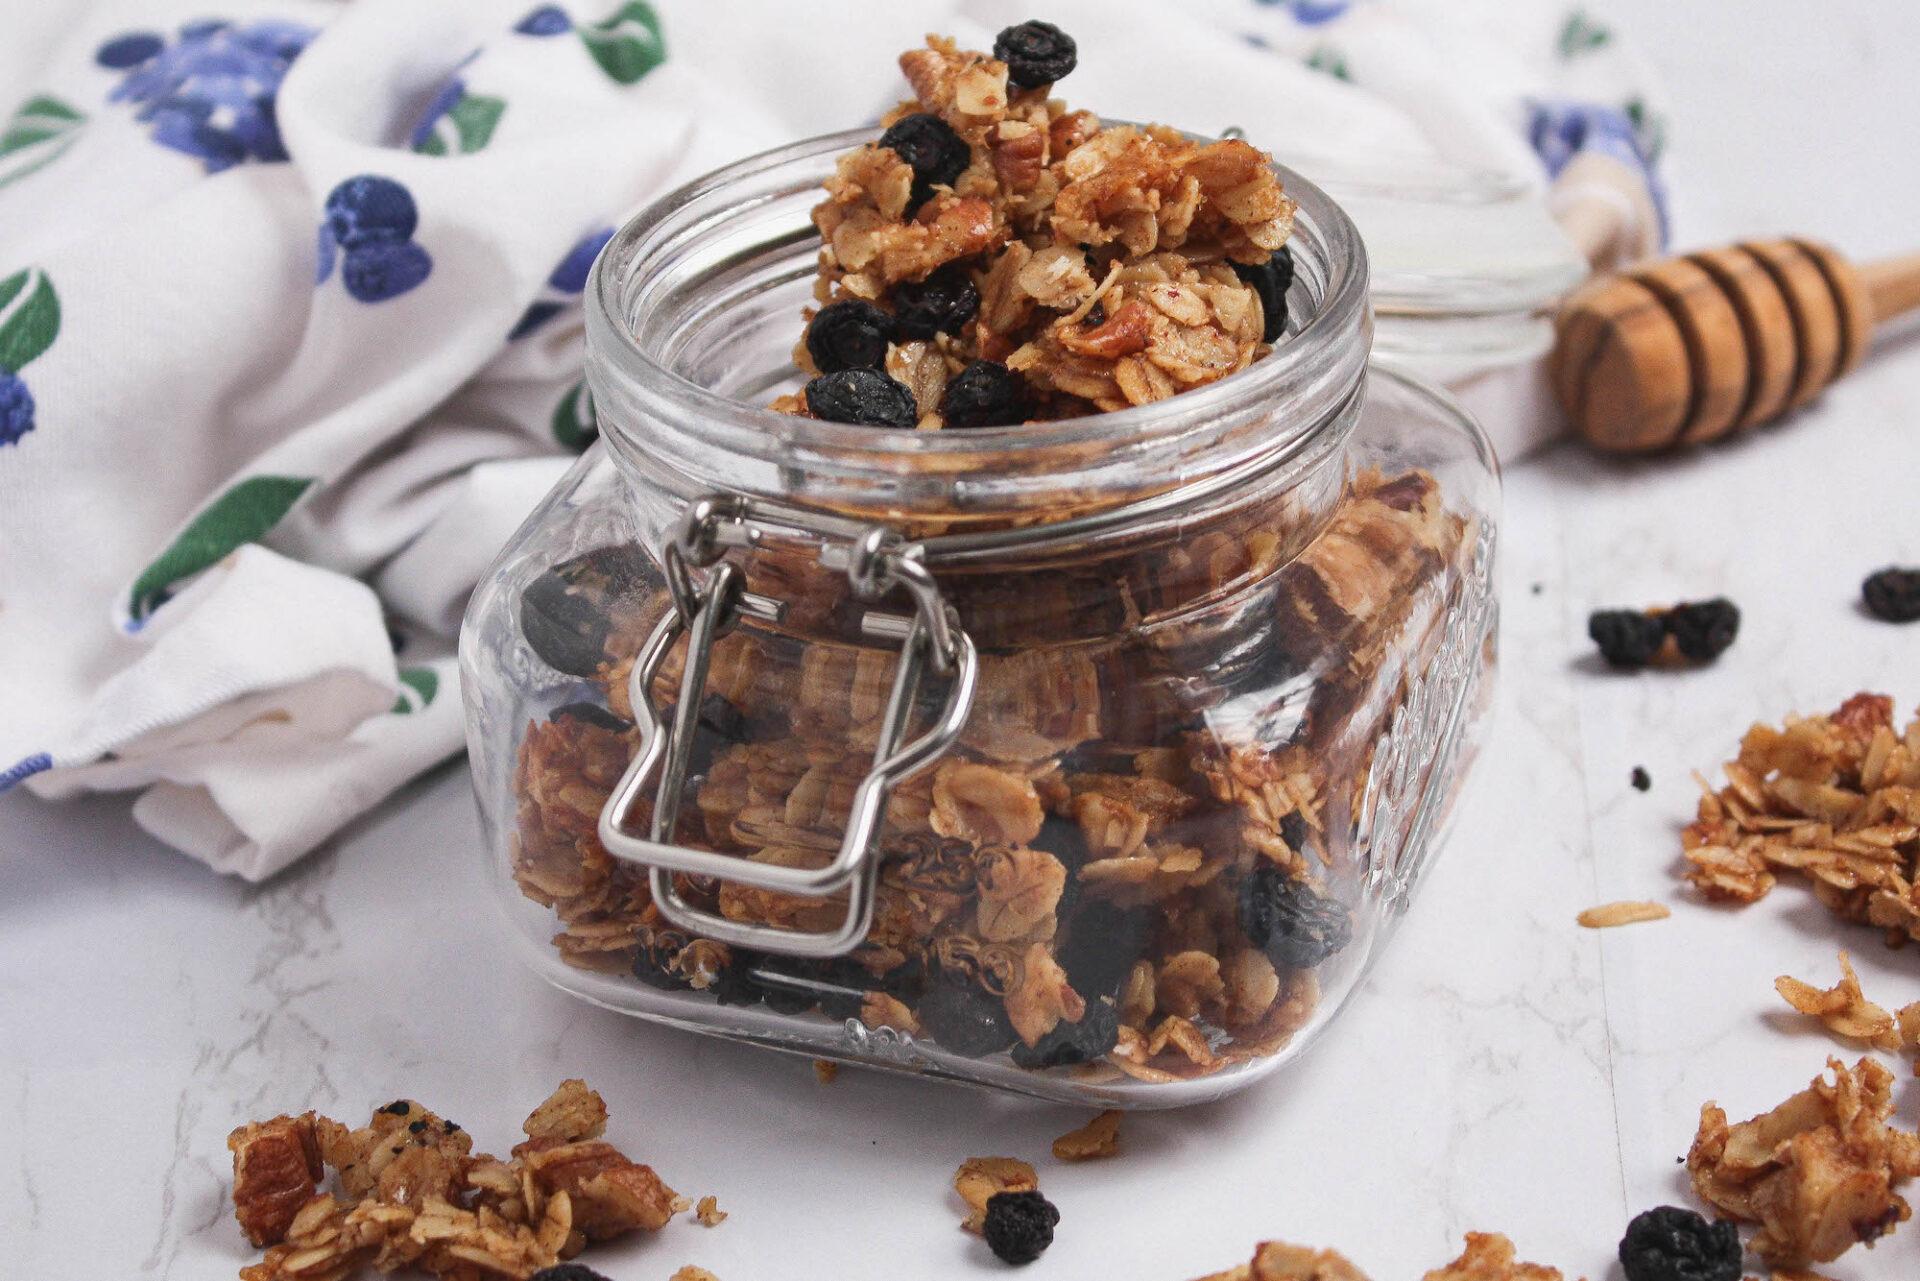 blueberry homemade granola | food blog | hearth health happiness